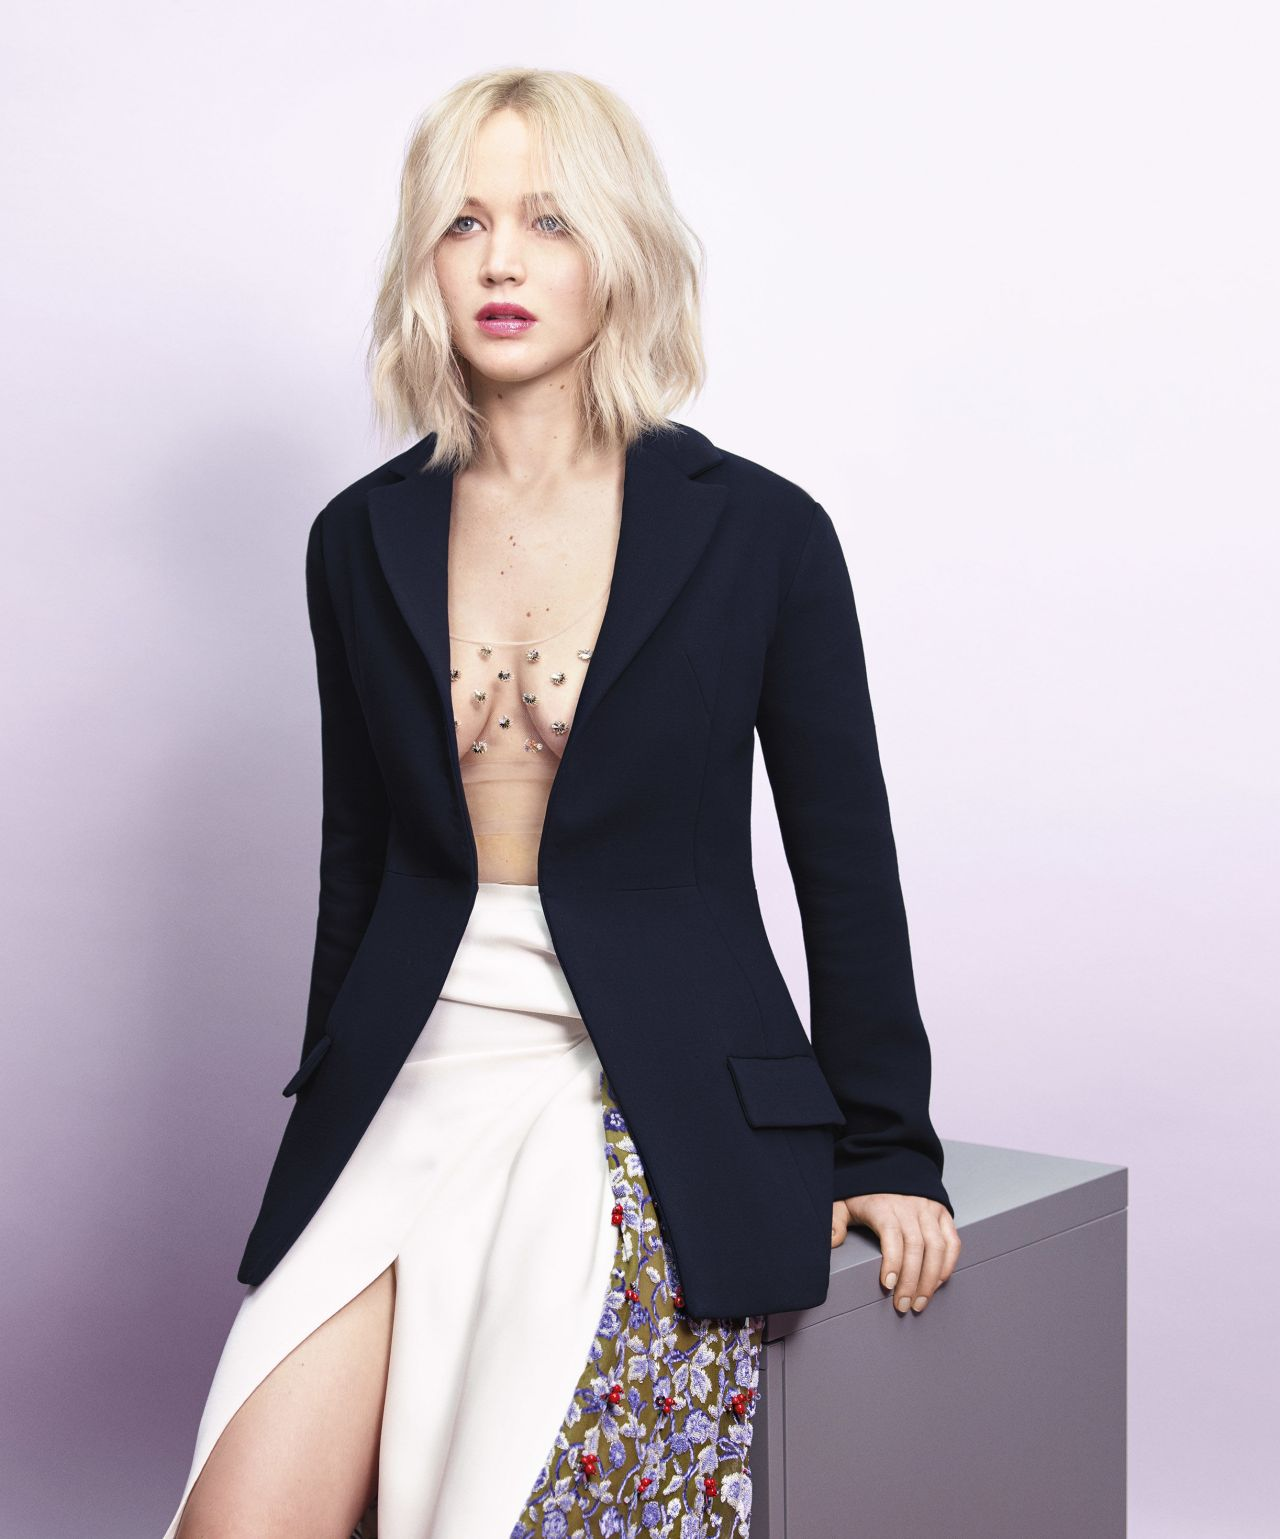 Jennifer Lawrence - Photo Shoot For Harpers Bazaar -9794